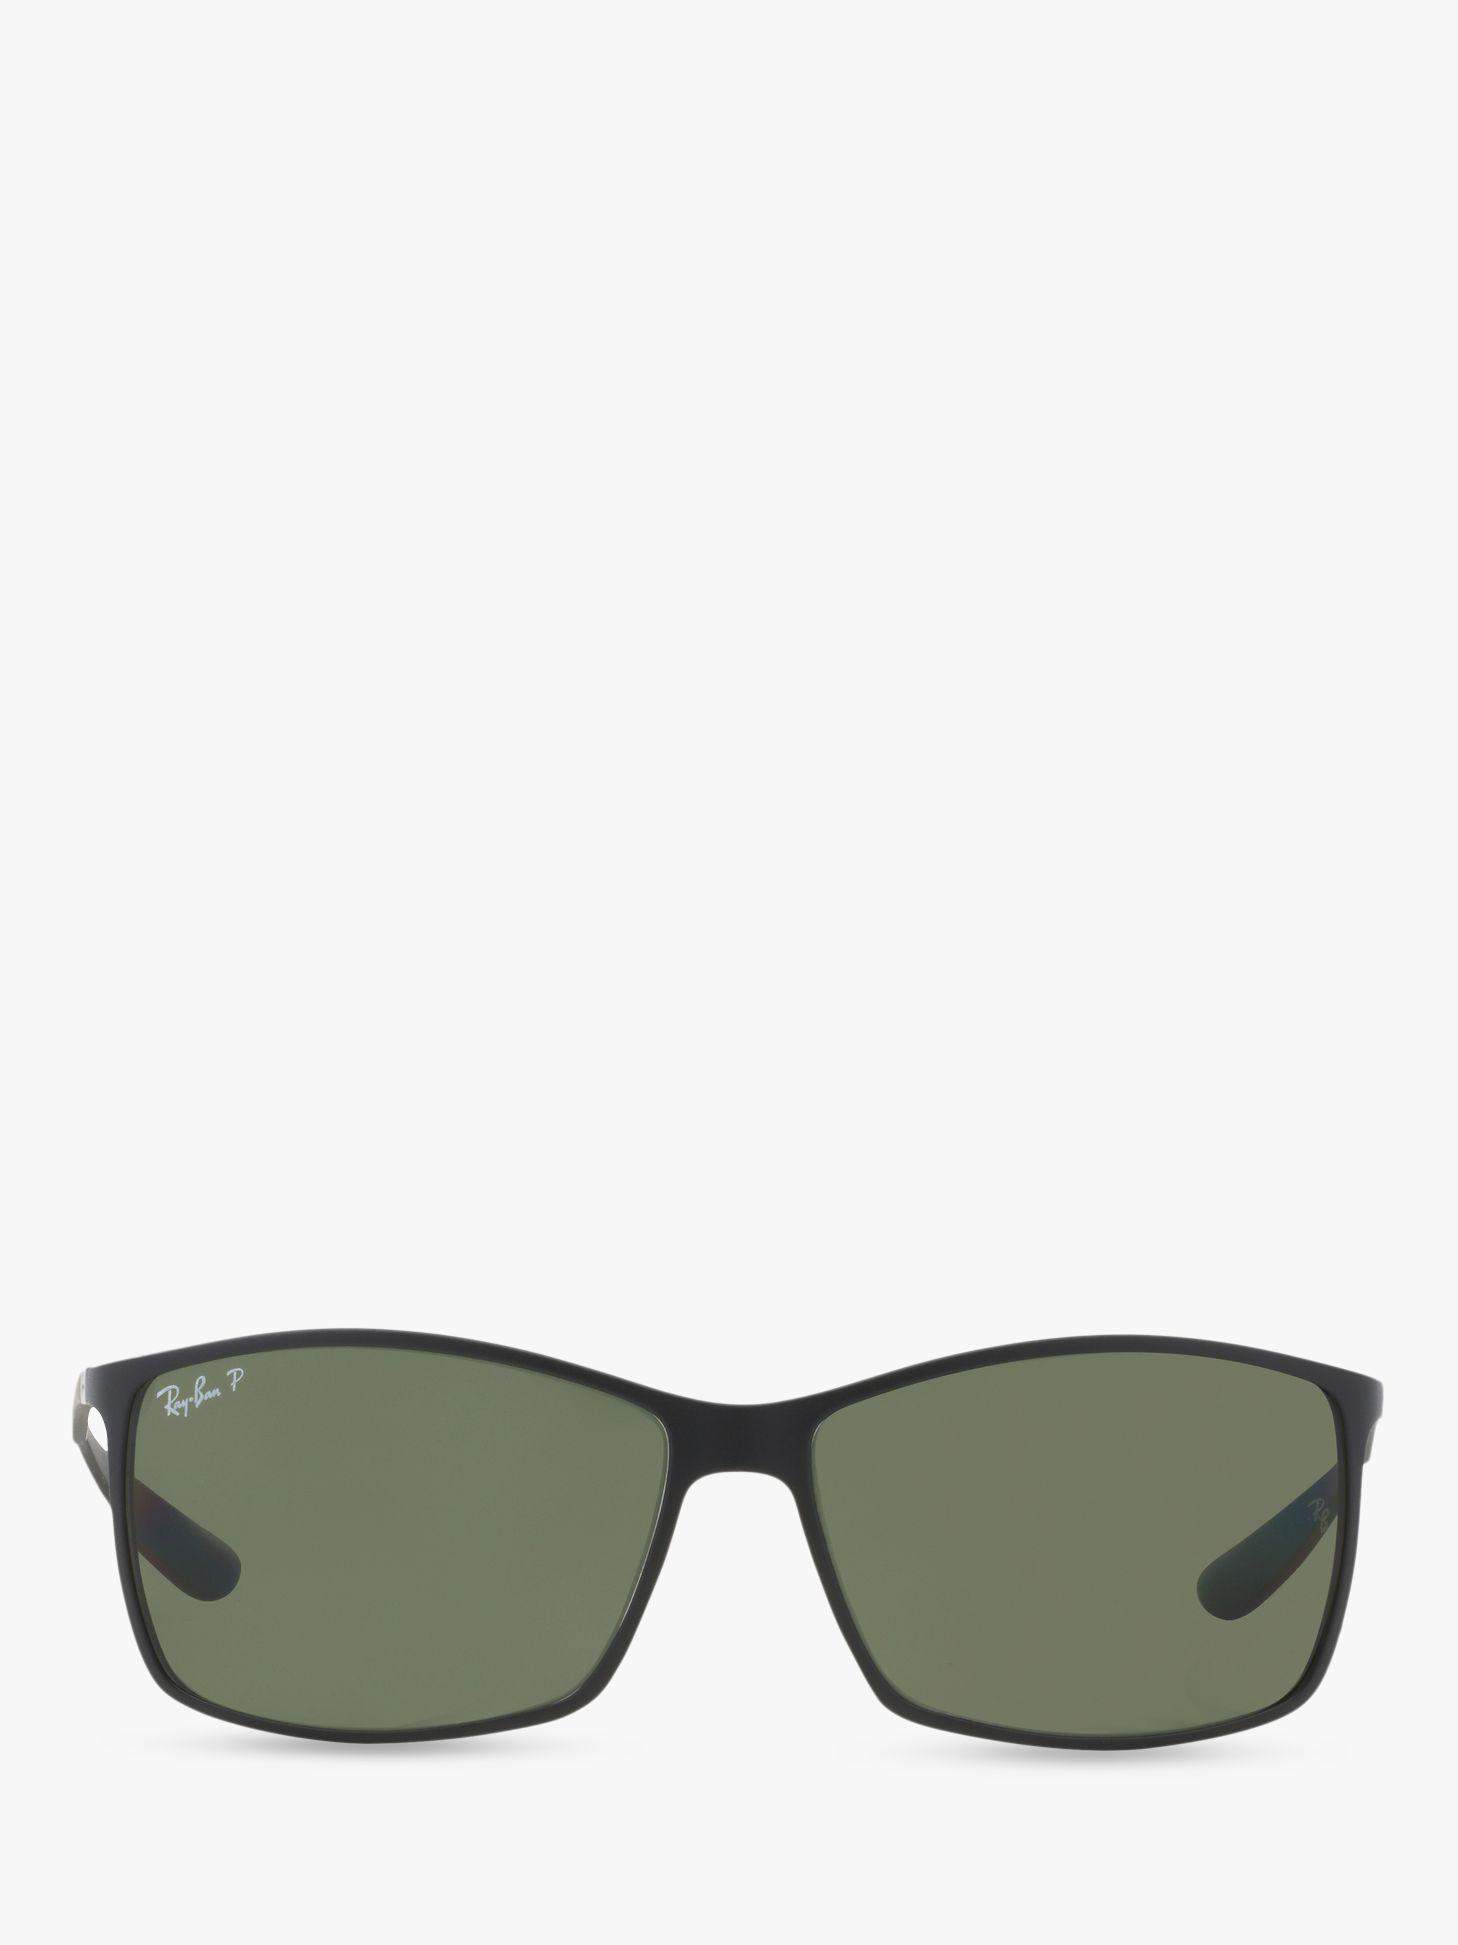 6c939bf7da Ray-Ban - Black Rb4179 Men s Liteforce Tech Polarised Rectangular  Sunglasses for Men - Lyst. View fullscreen